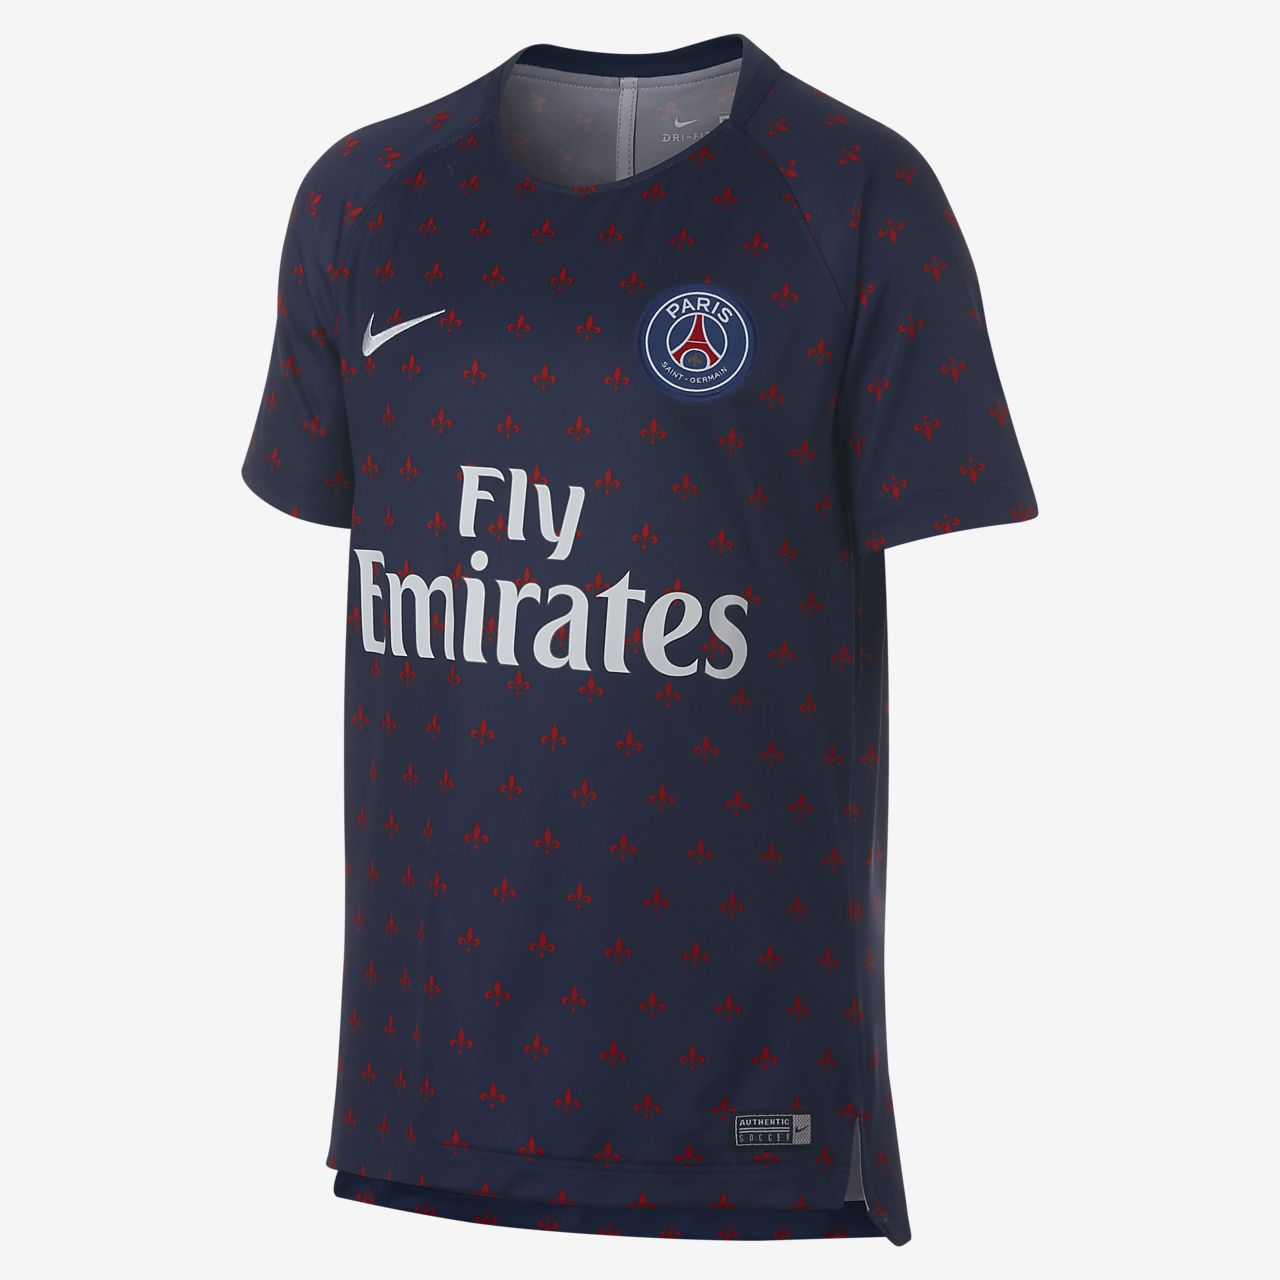 Maglia Paris Saint-Germain personalizzata